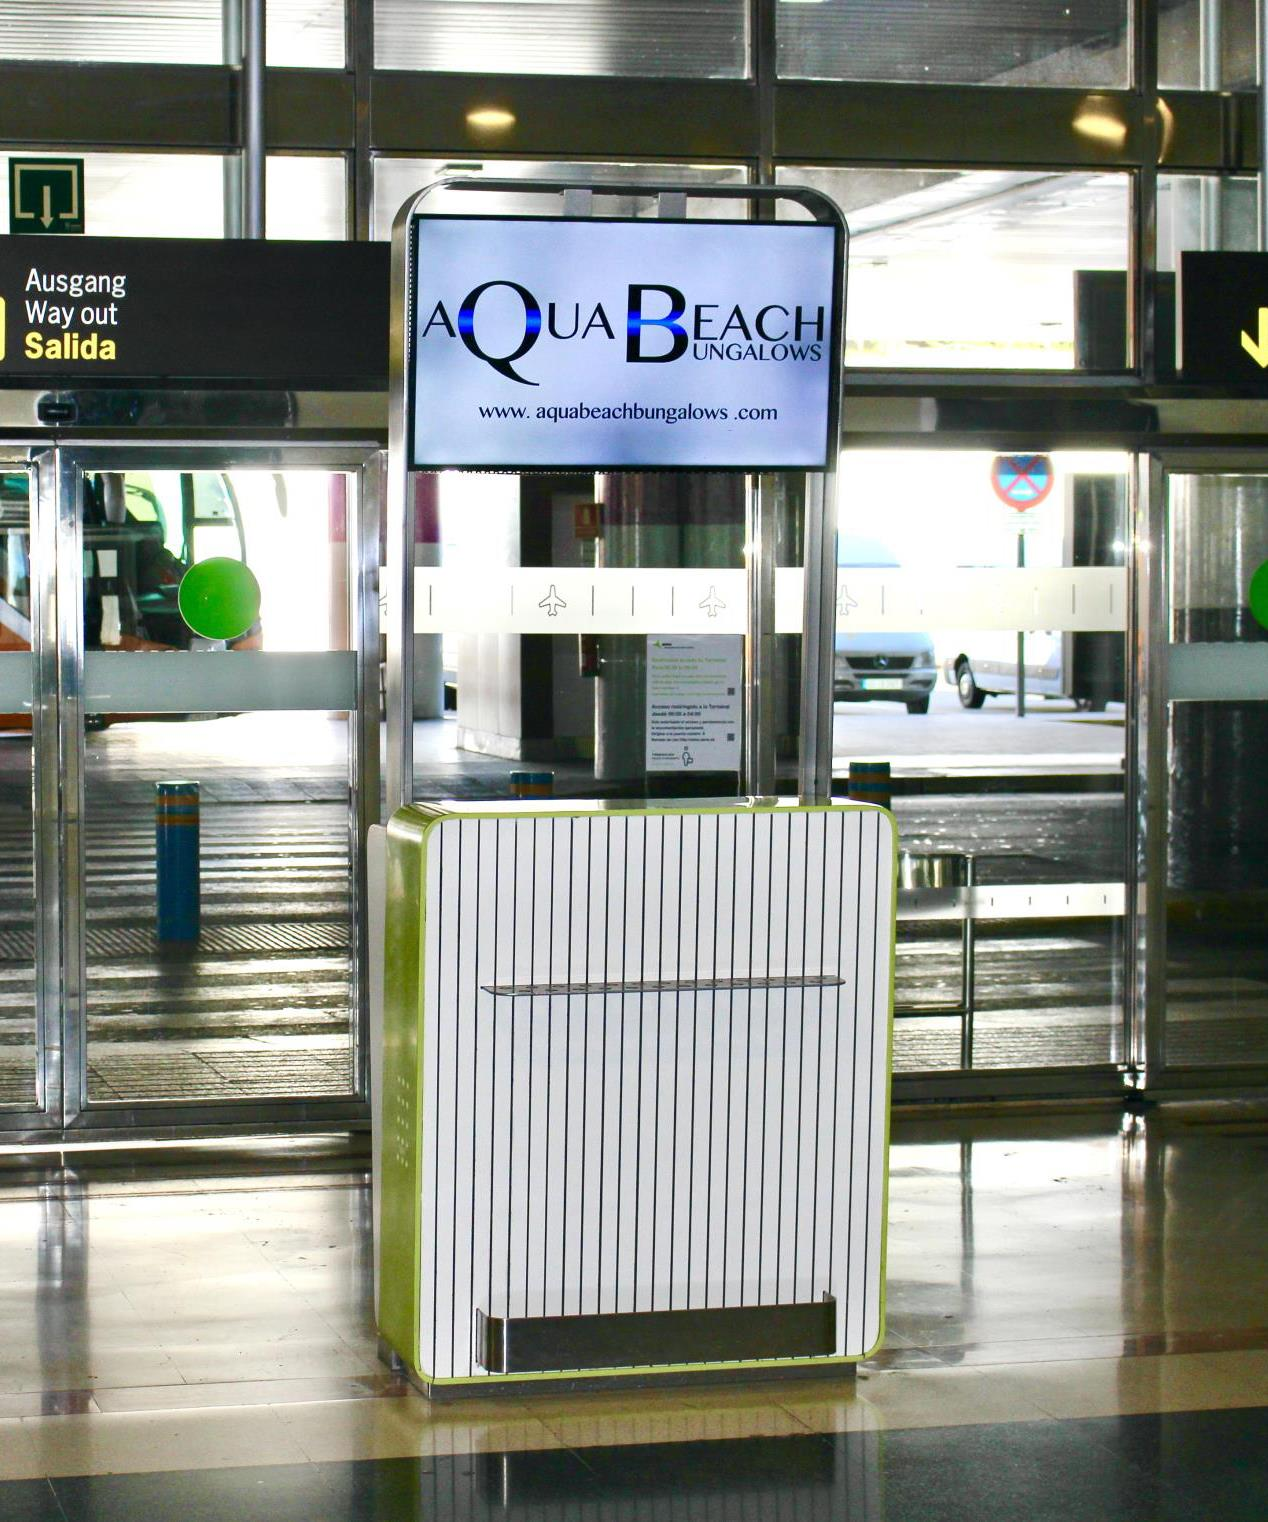 Transfers airport service gran canaria las palmas hotel service aqua beach bungalows .JPG